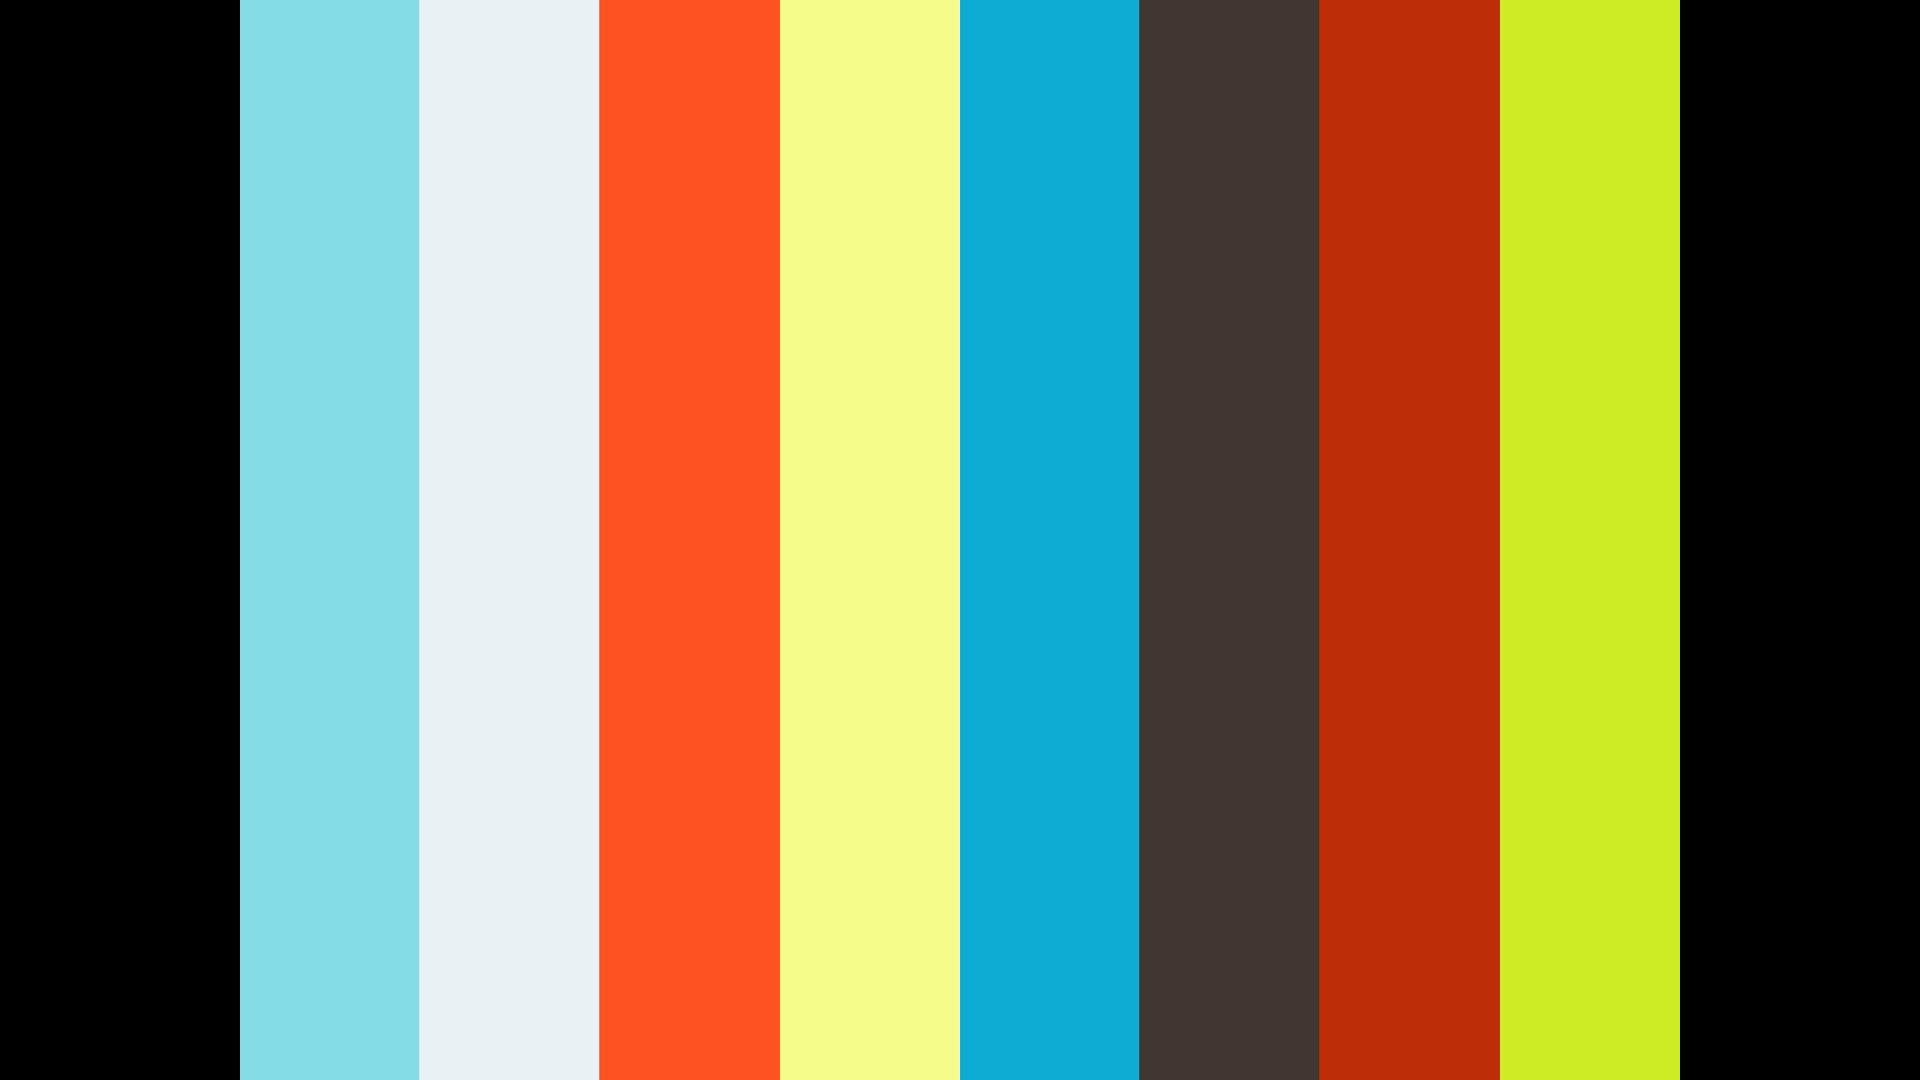 Rob Akerele - What does discrimination feel like? - Rob Akerele